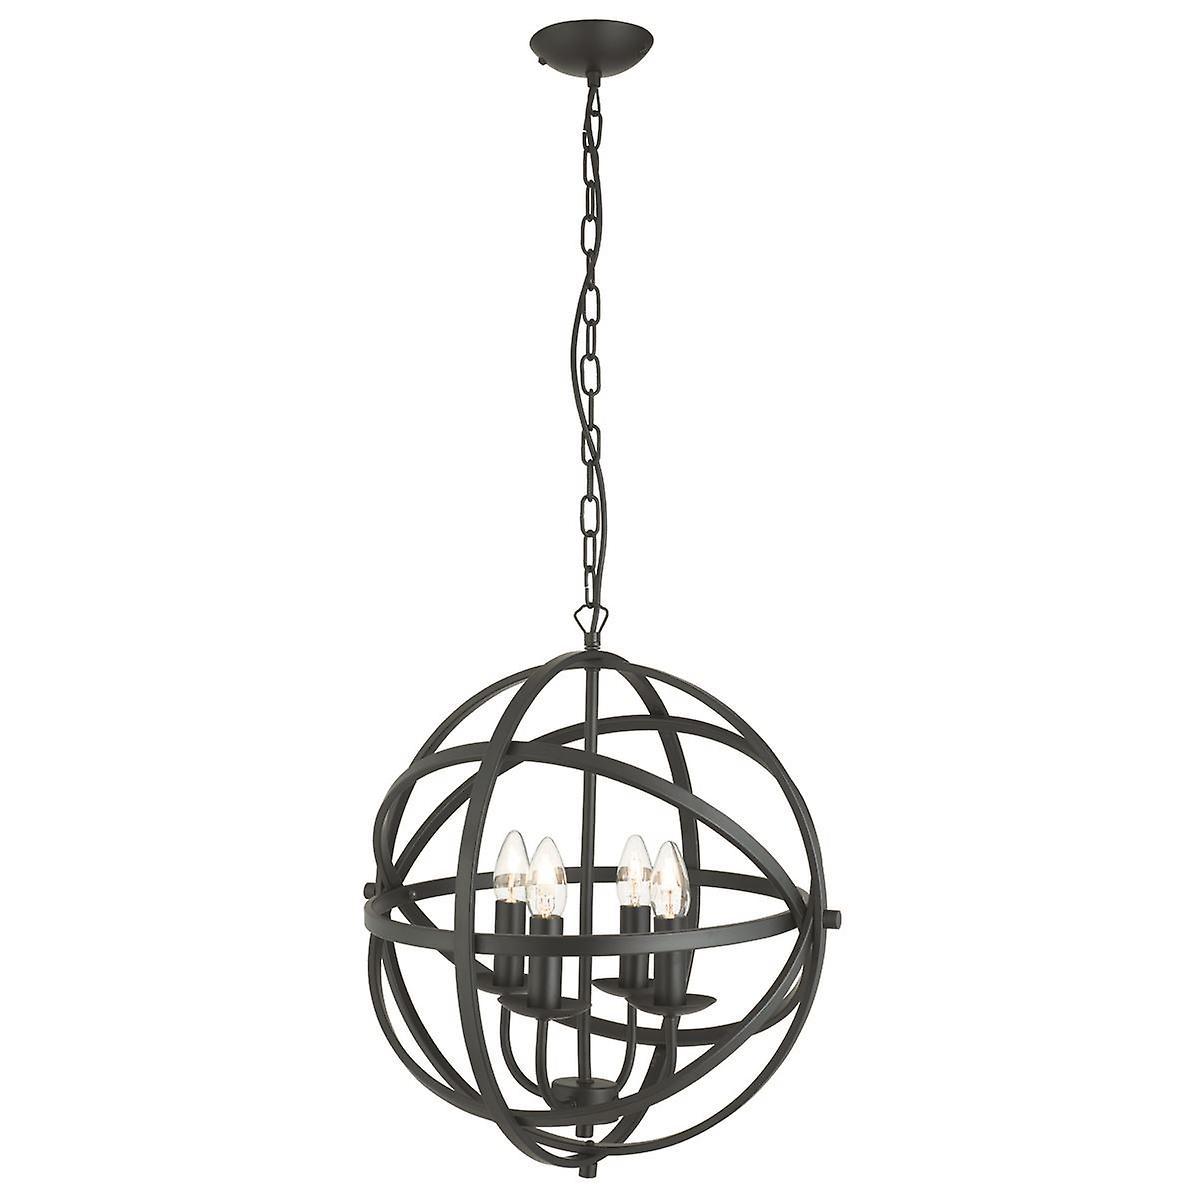 Orbit Matt noir Four Light Lantern Pendant - Searchlight 2474-4BK